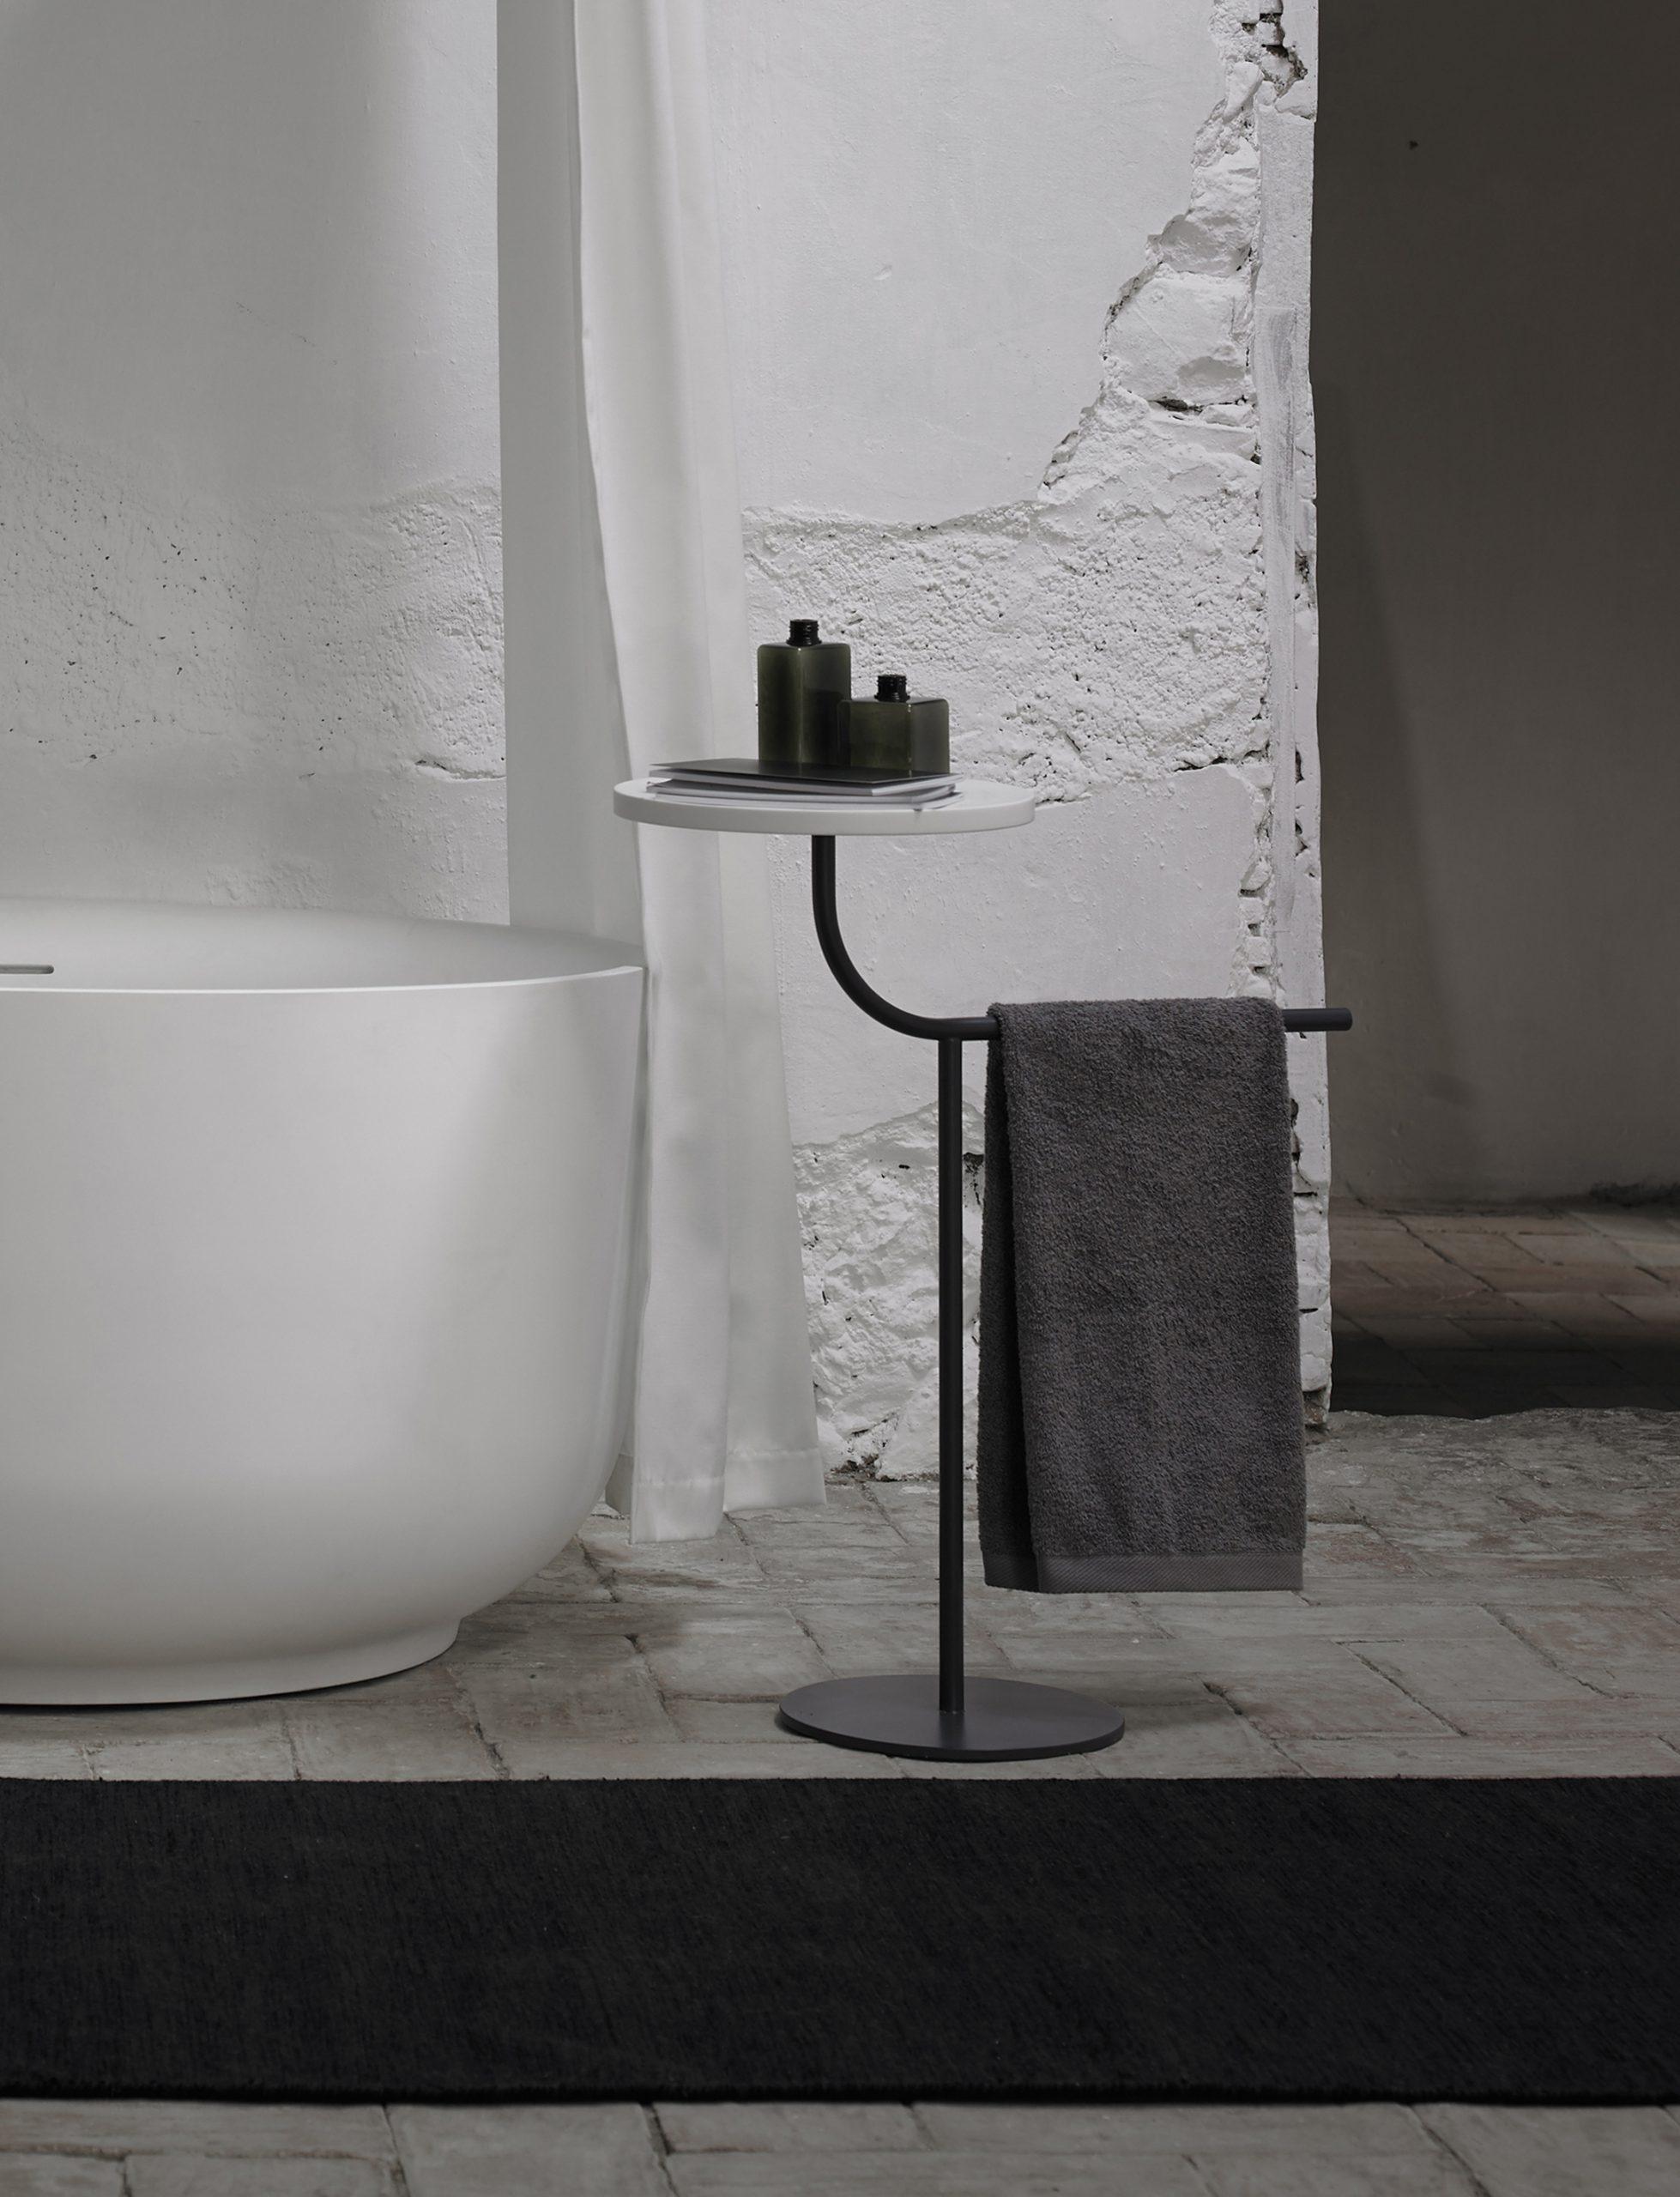 Bivio side table designed by Debiasi Sandri for Inbani